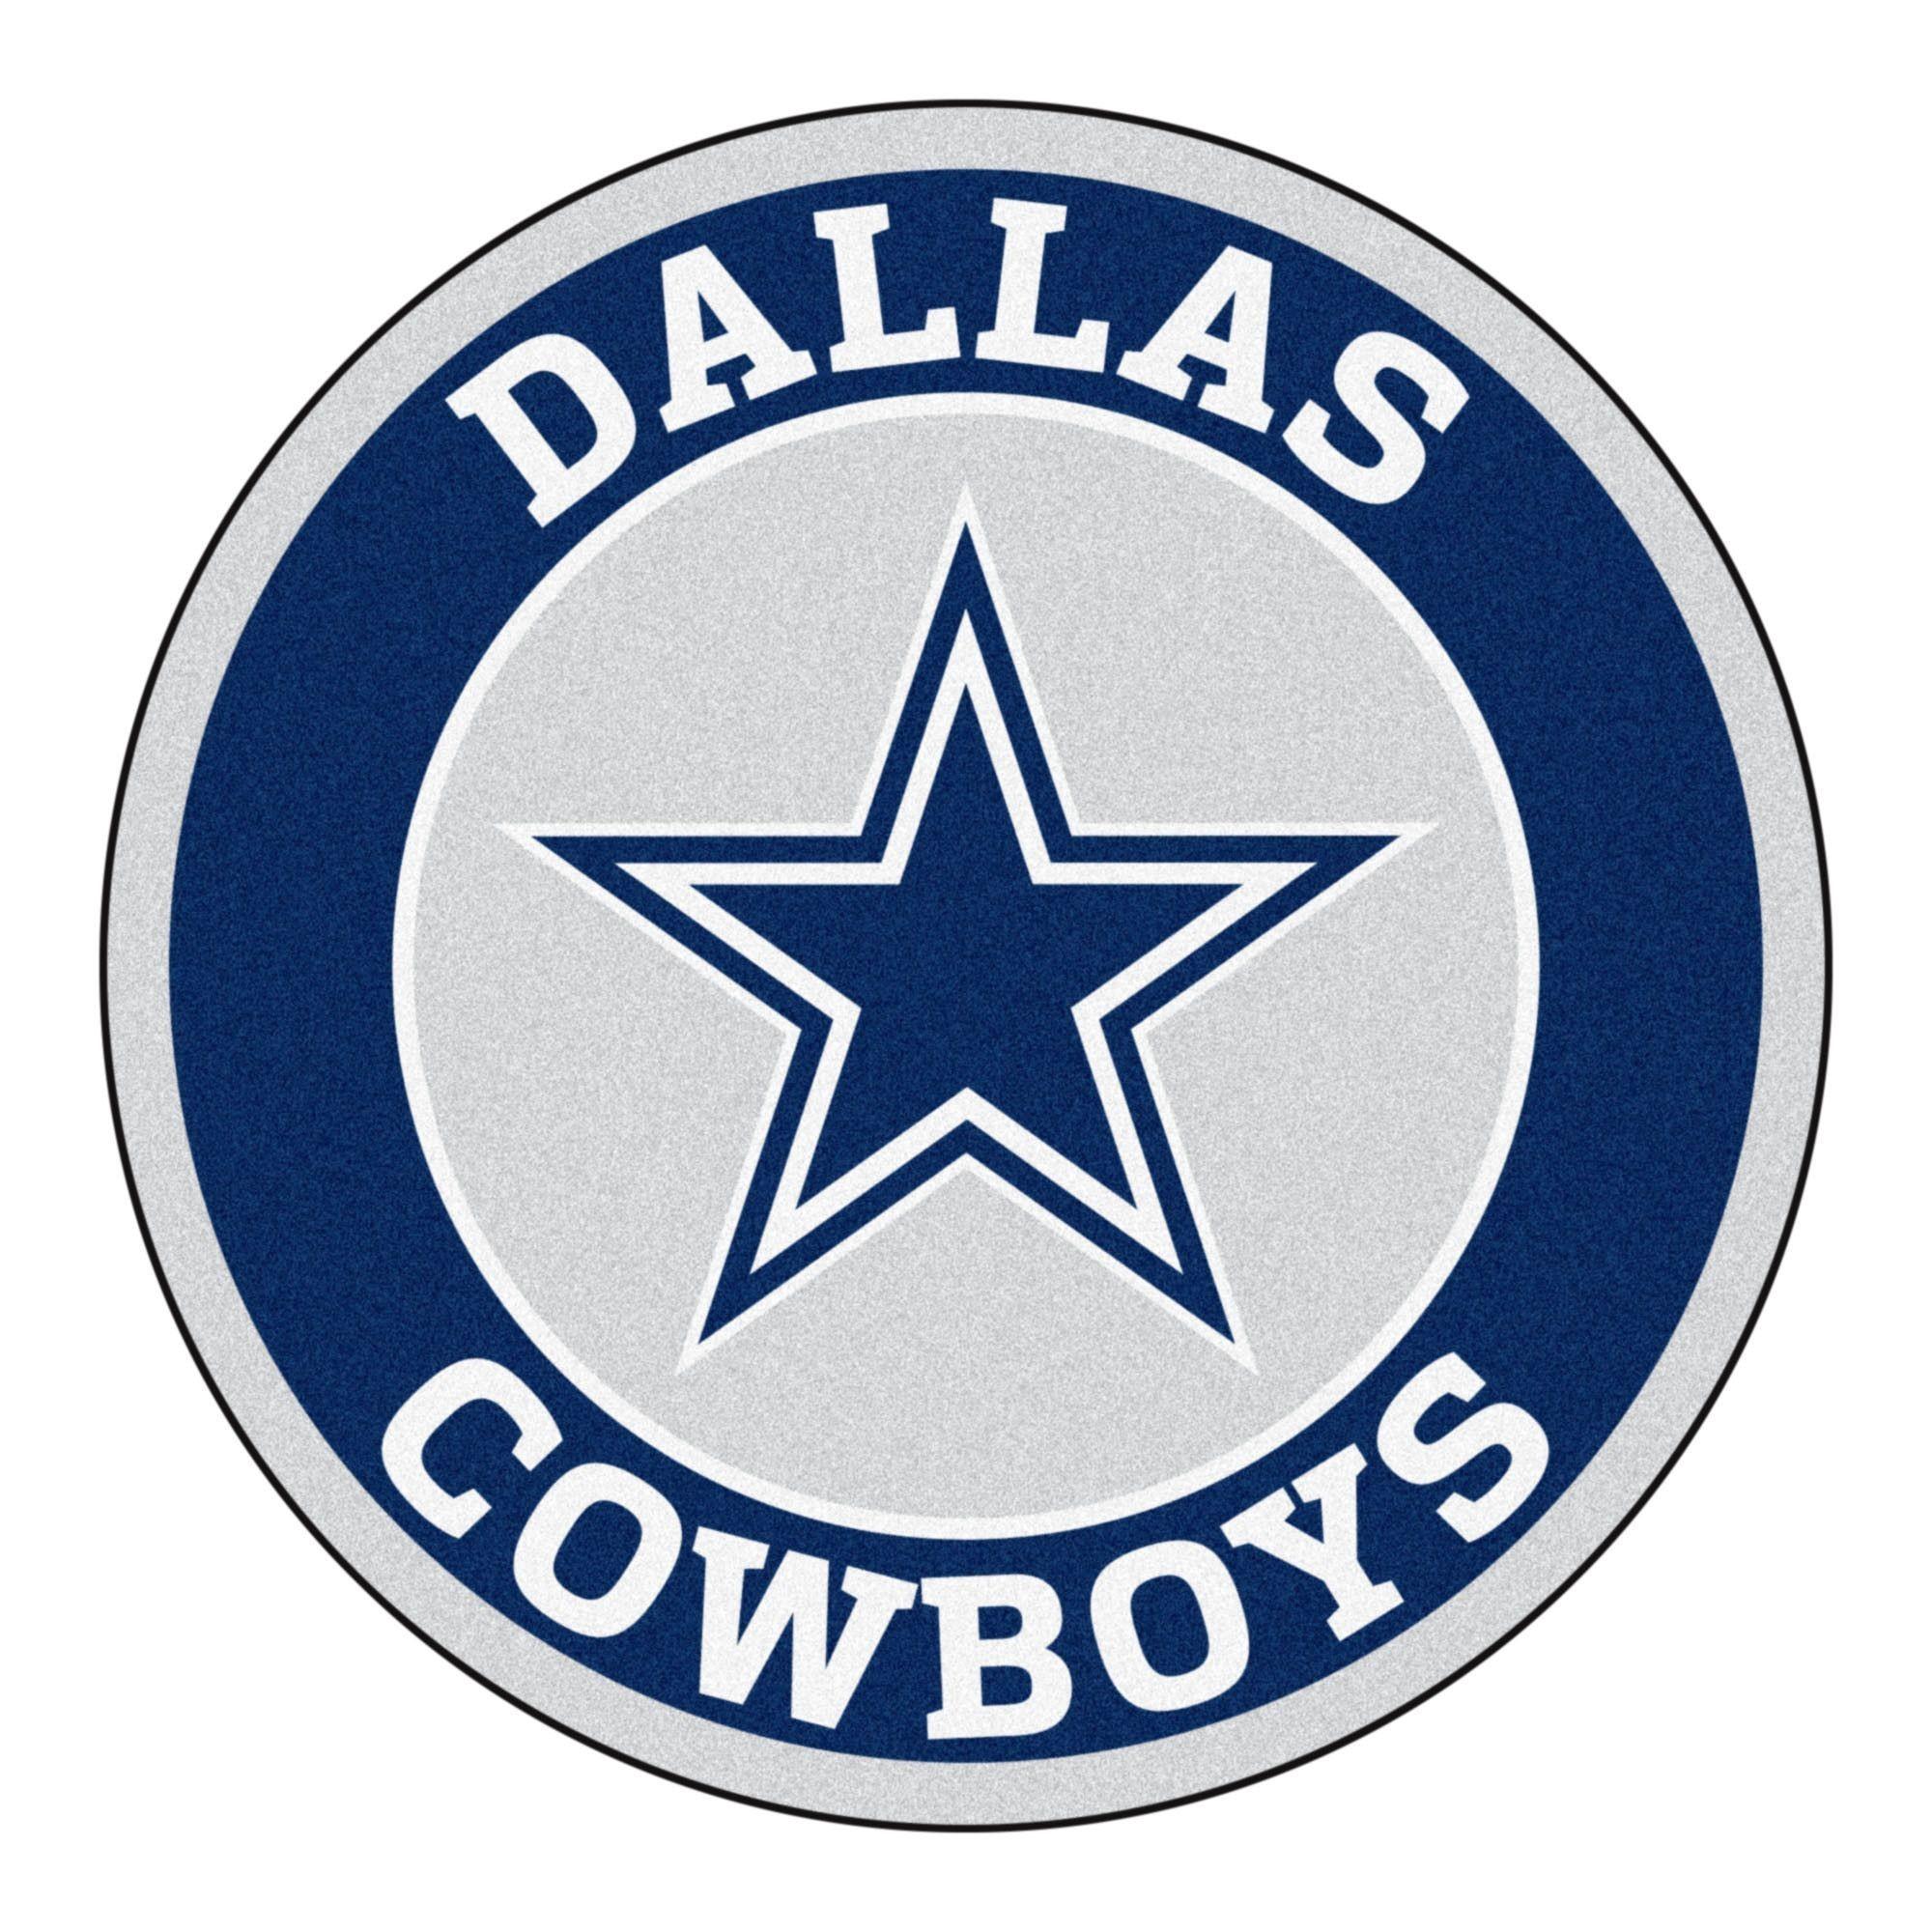 Dallas Cowboys Logos and Wallpapers (65+ images)